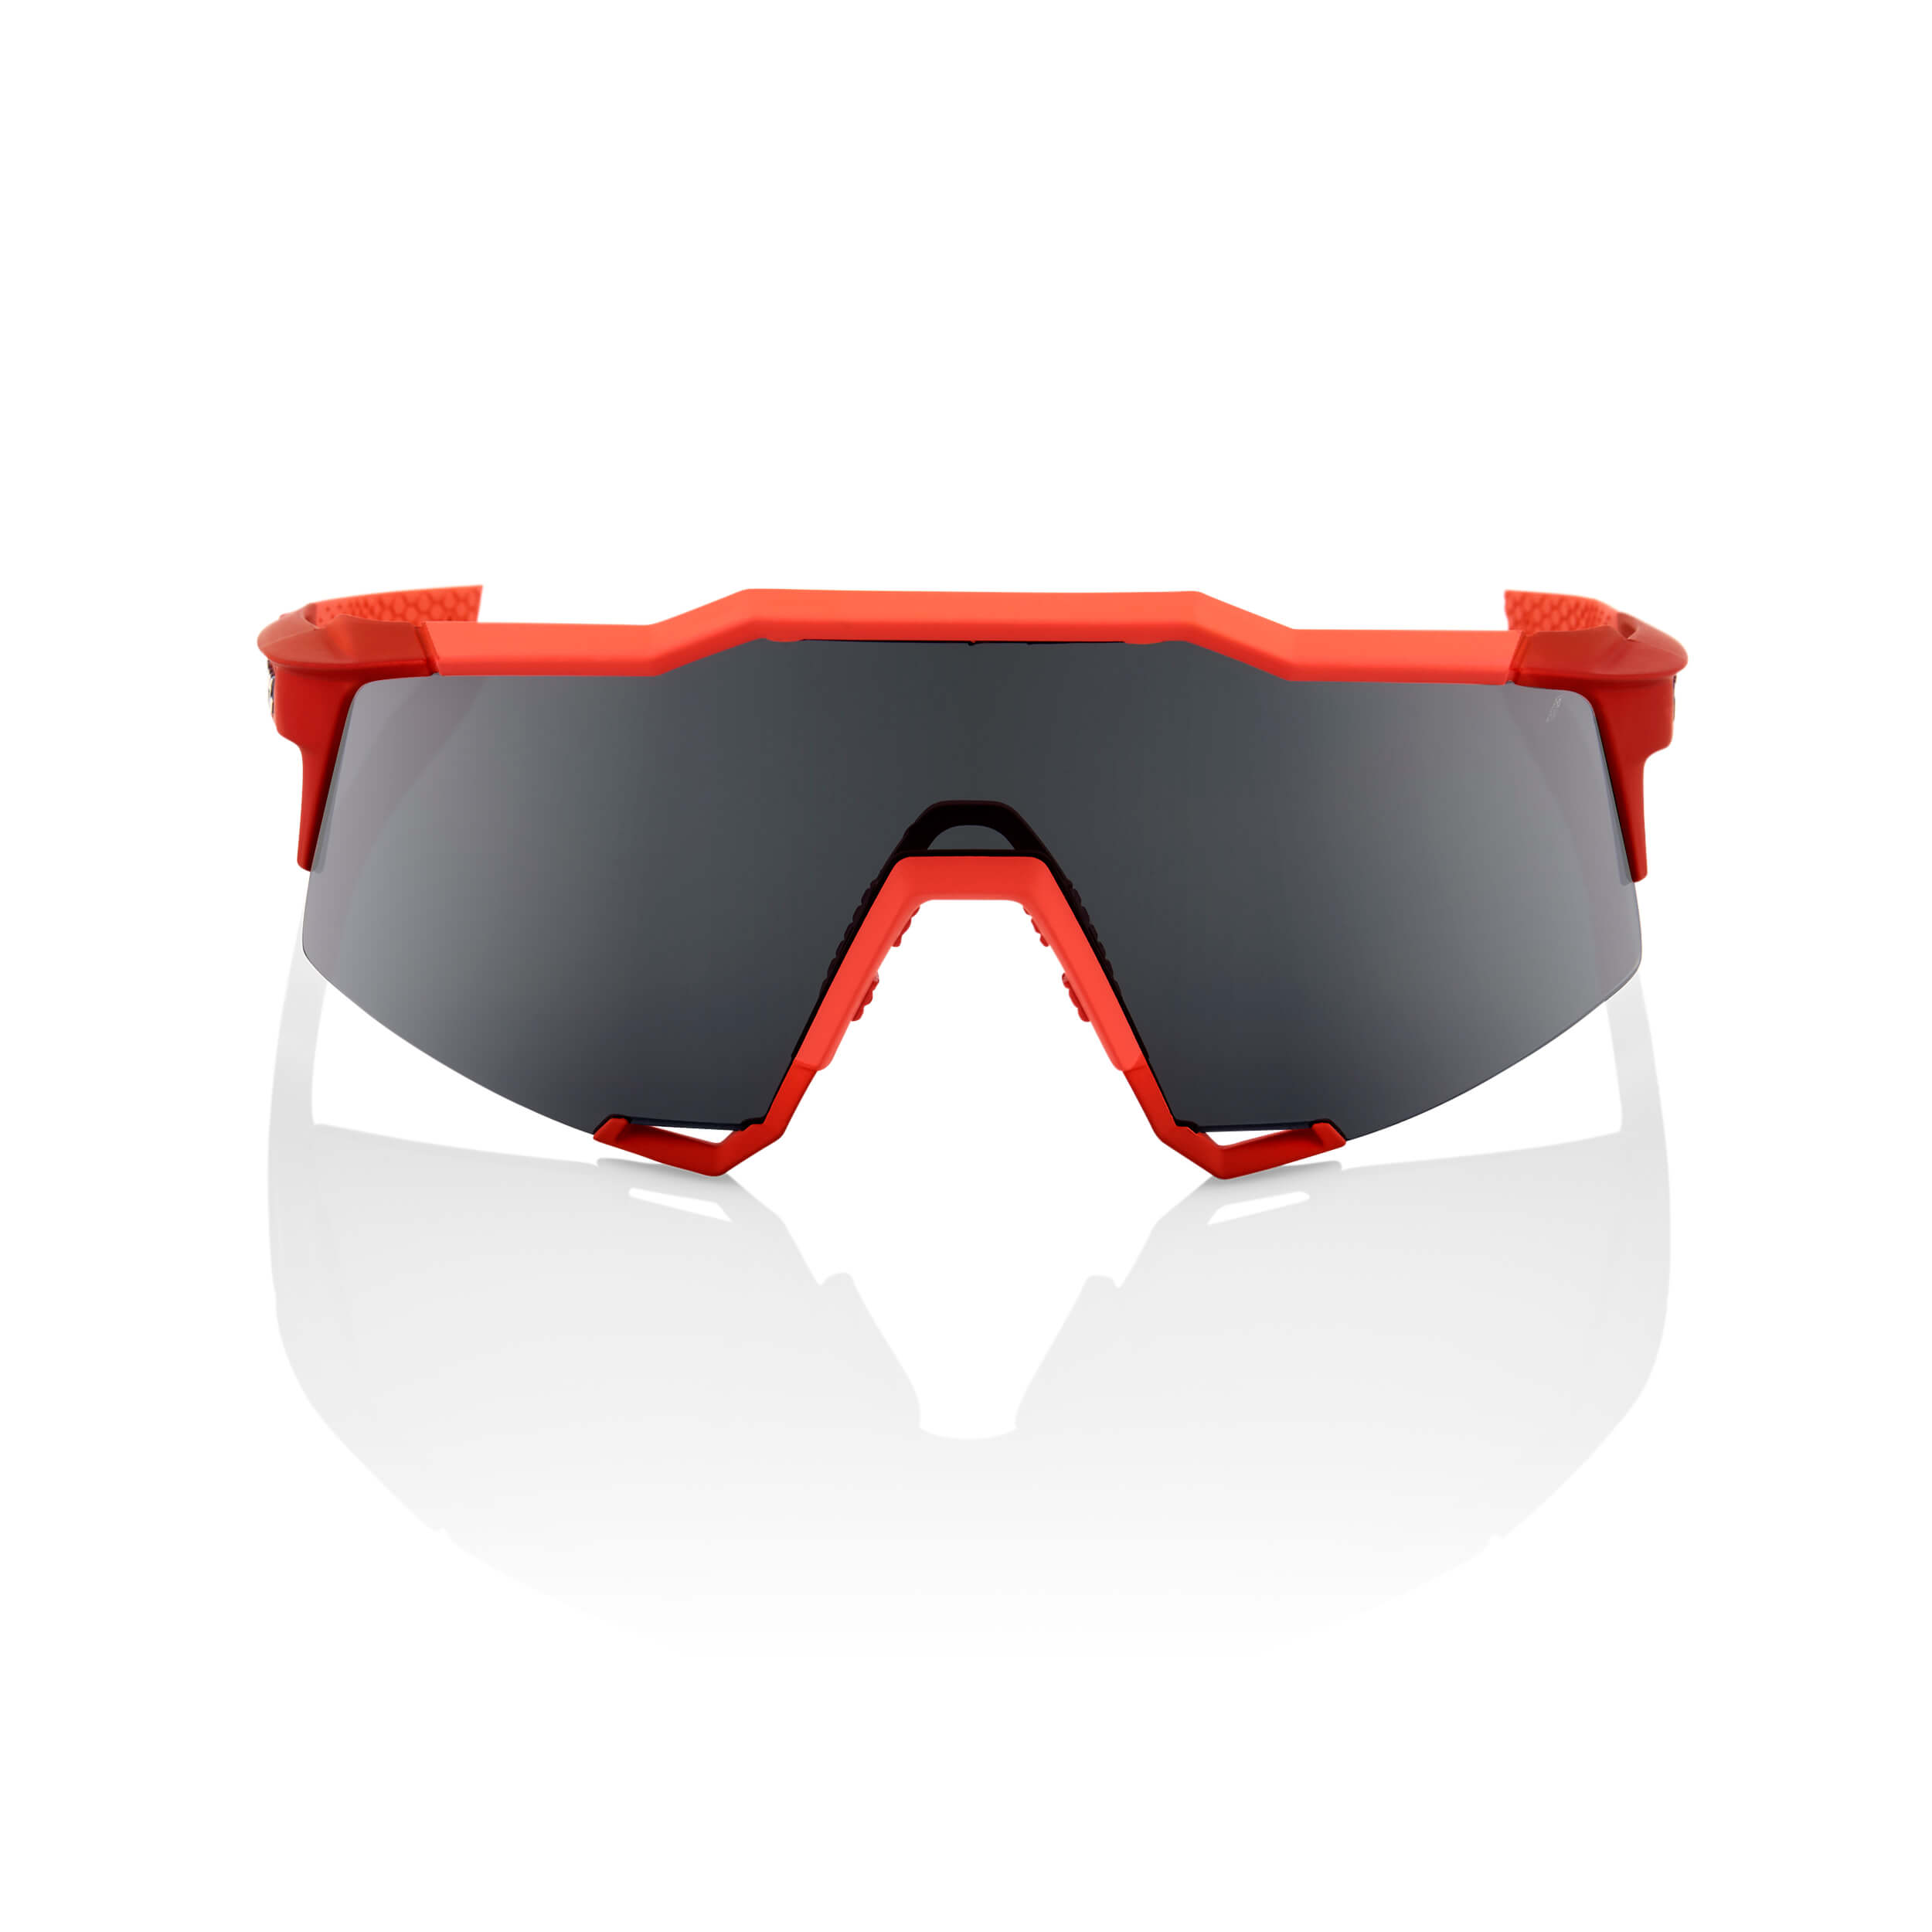 SPEEDCRAFT – Soft Tact Coral – Black Mirror Lens